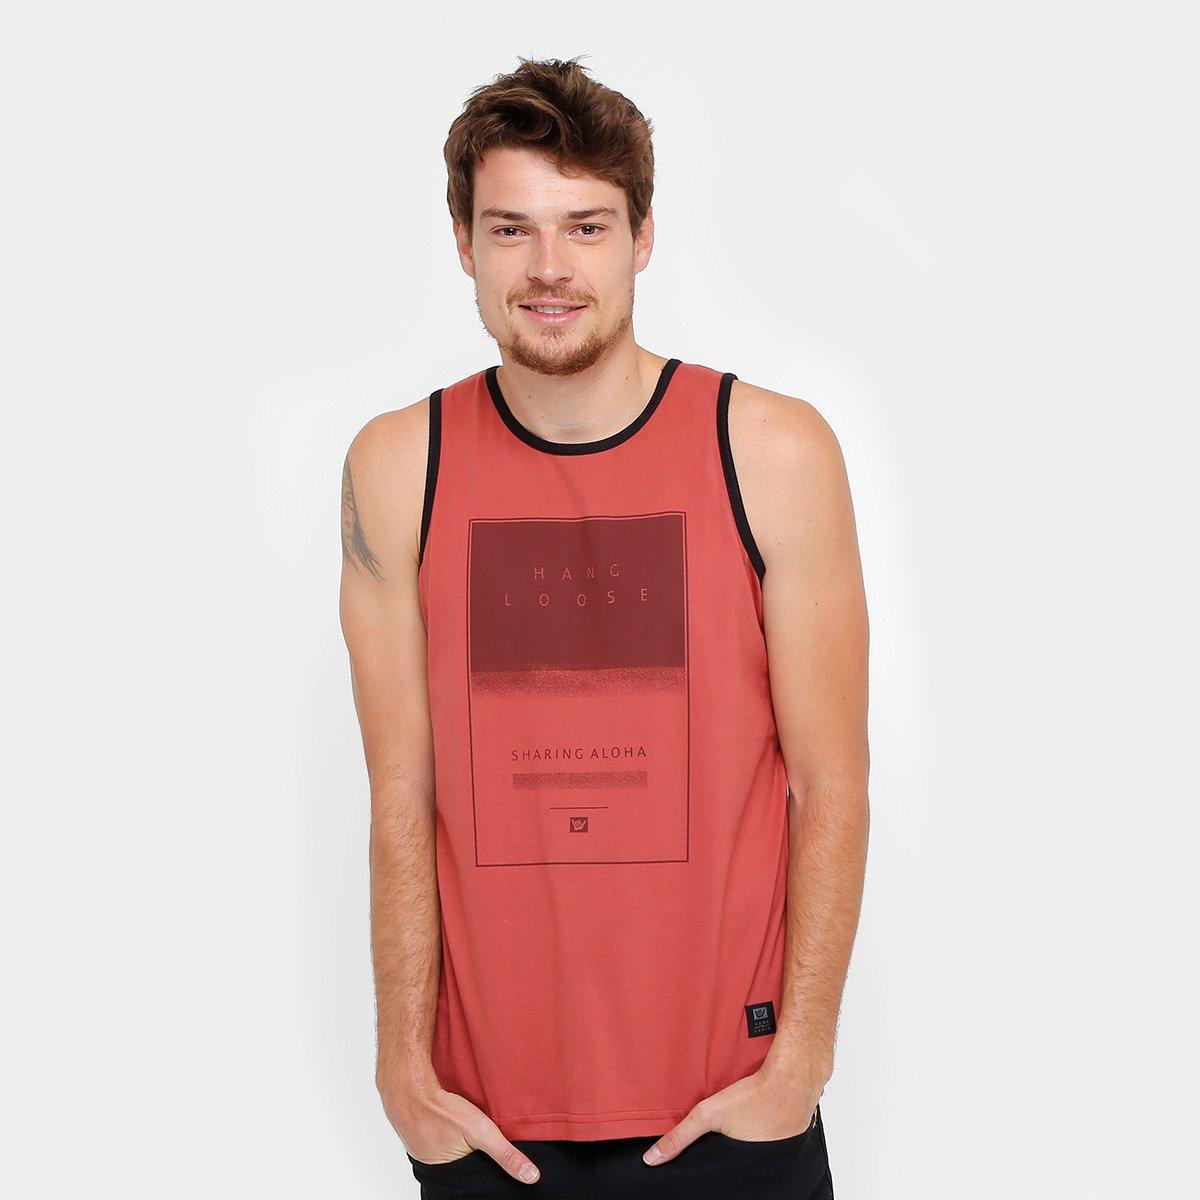 Camiseta Regata Hang Loose Silk Share Masculina - Compre Agora ... af372714bb0